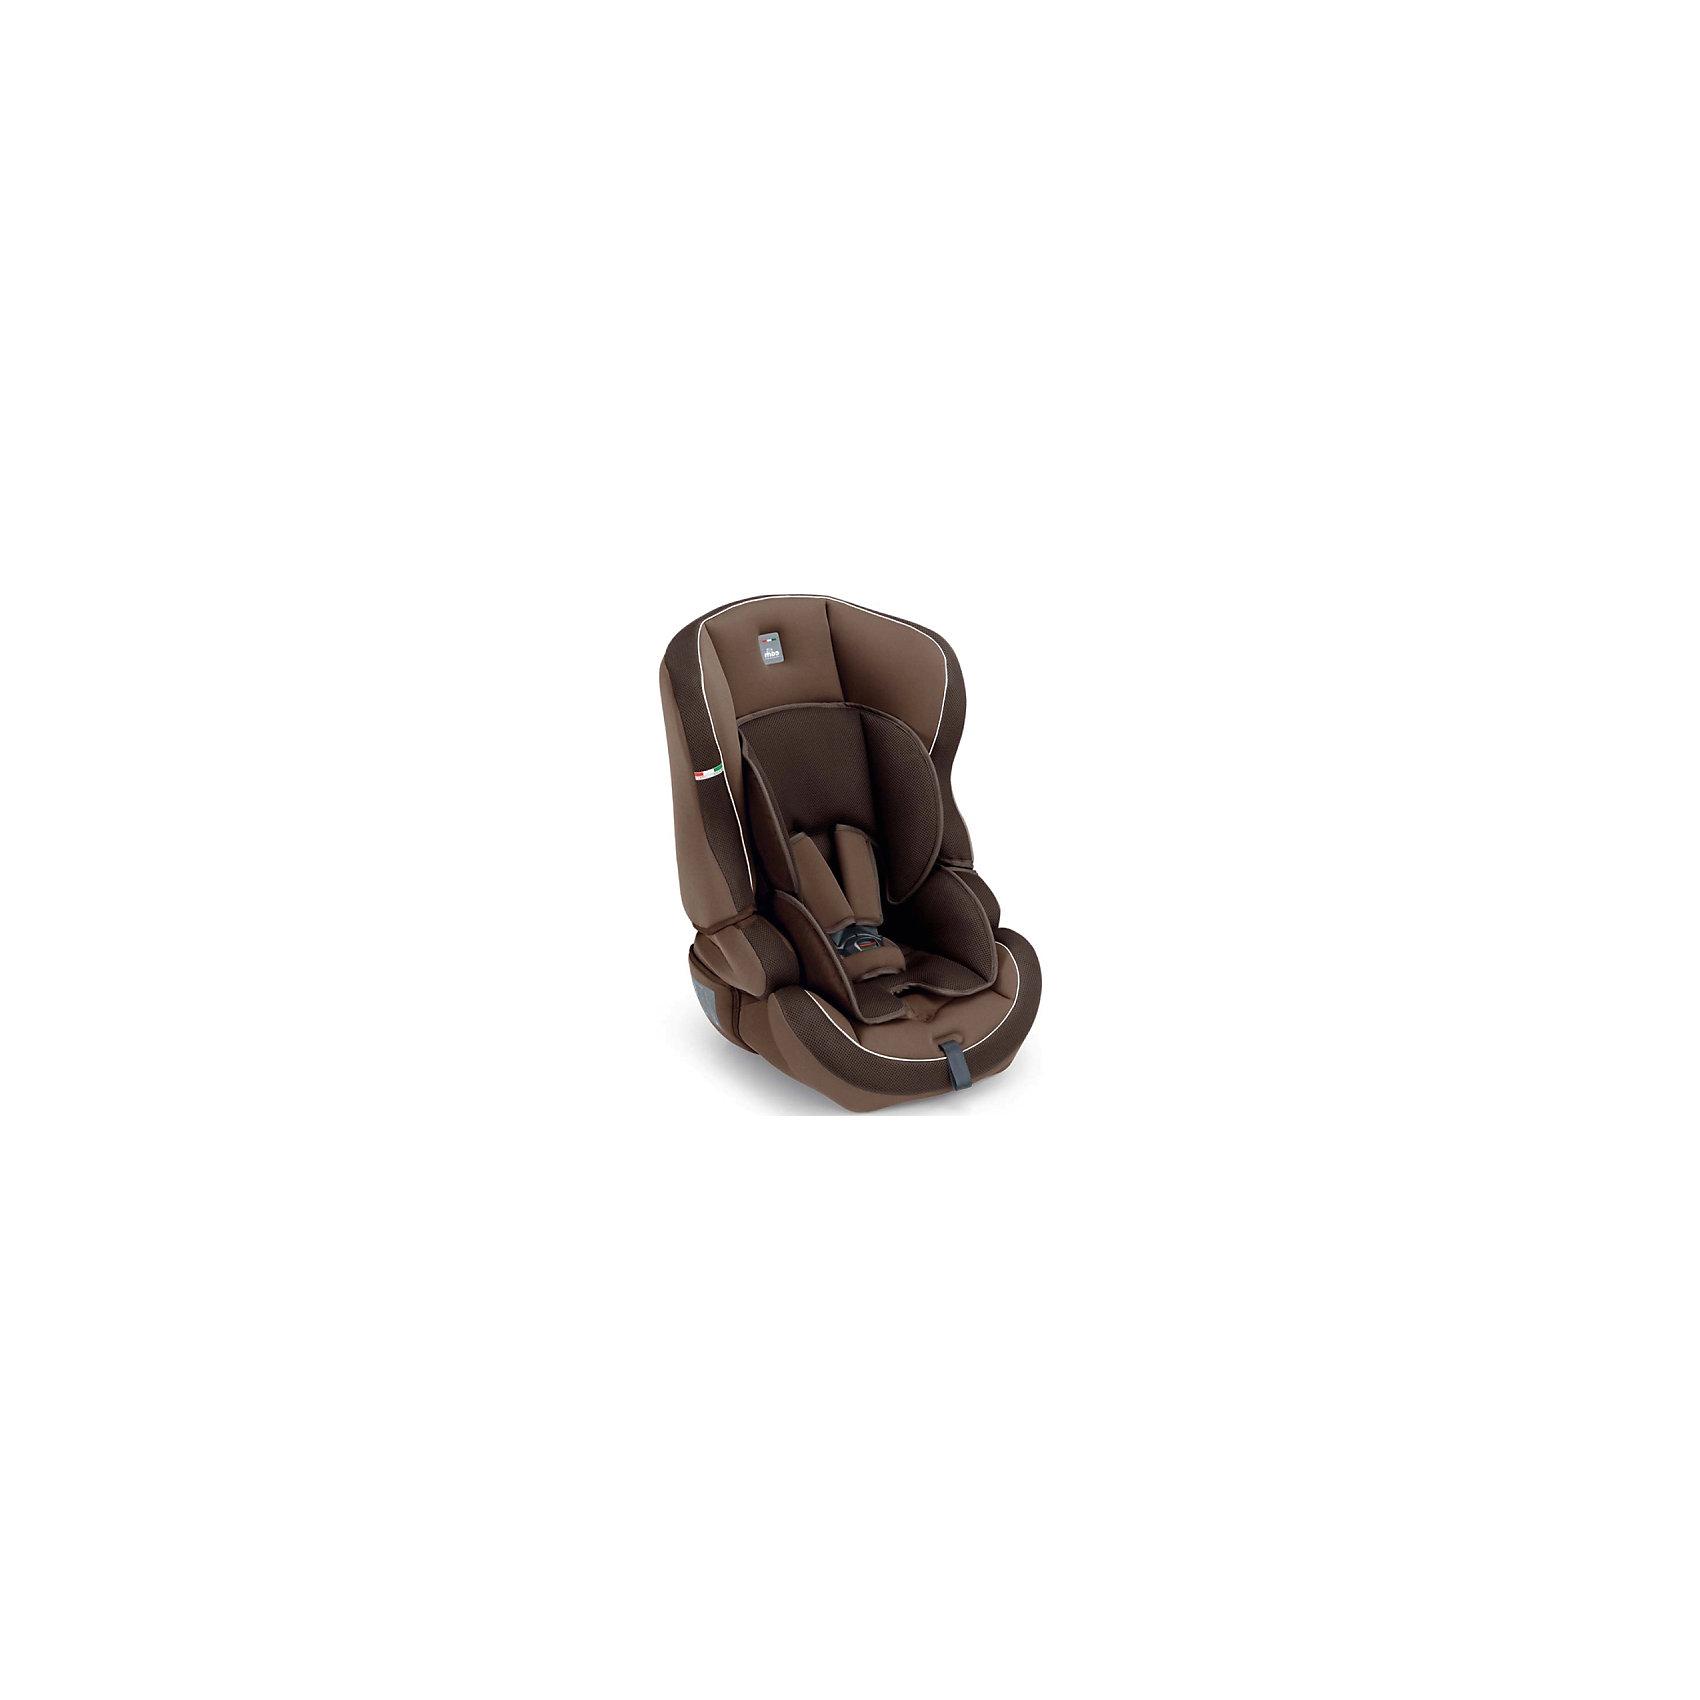 Автокресло Travel Evolution, 9-36кг., CAM, шоколад